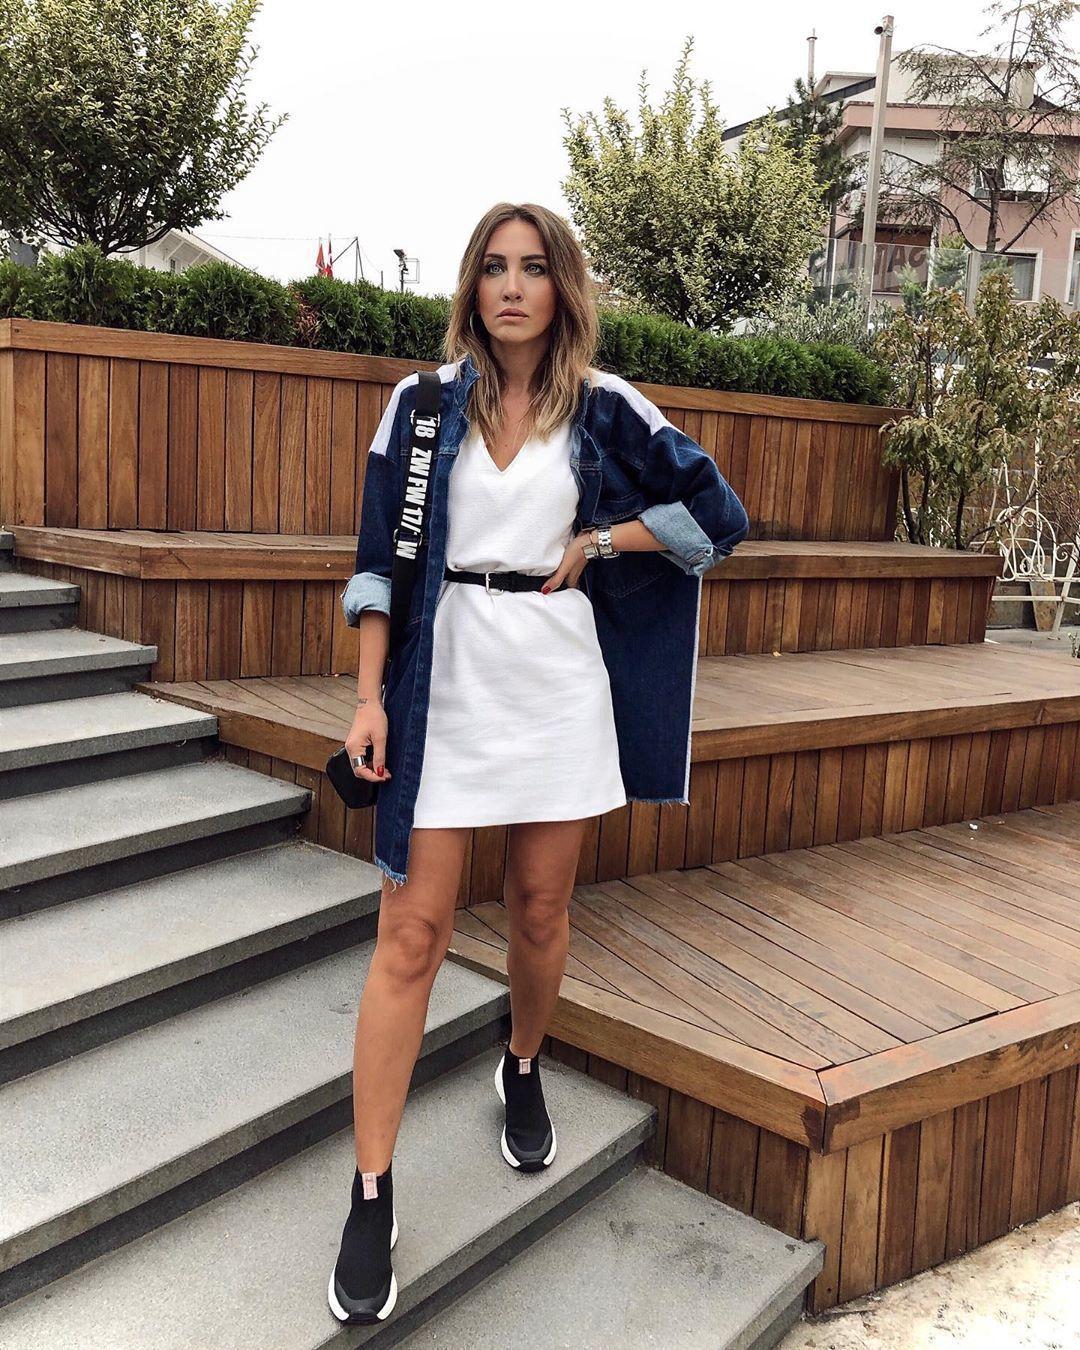 shoes sneakers high top sneakers zara white dress denim jacket oversized jacket black bag